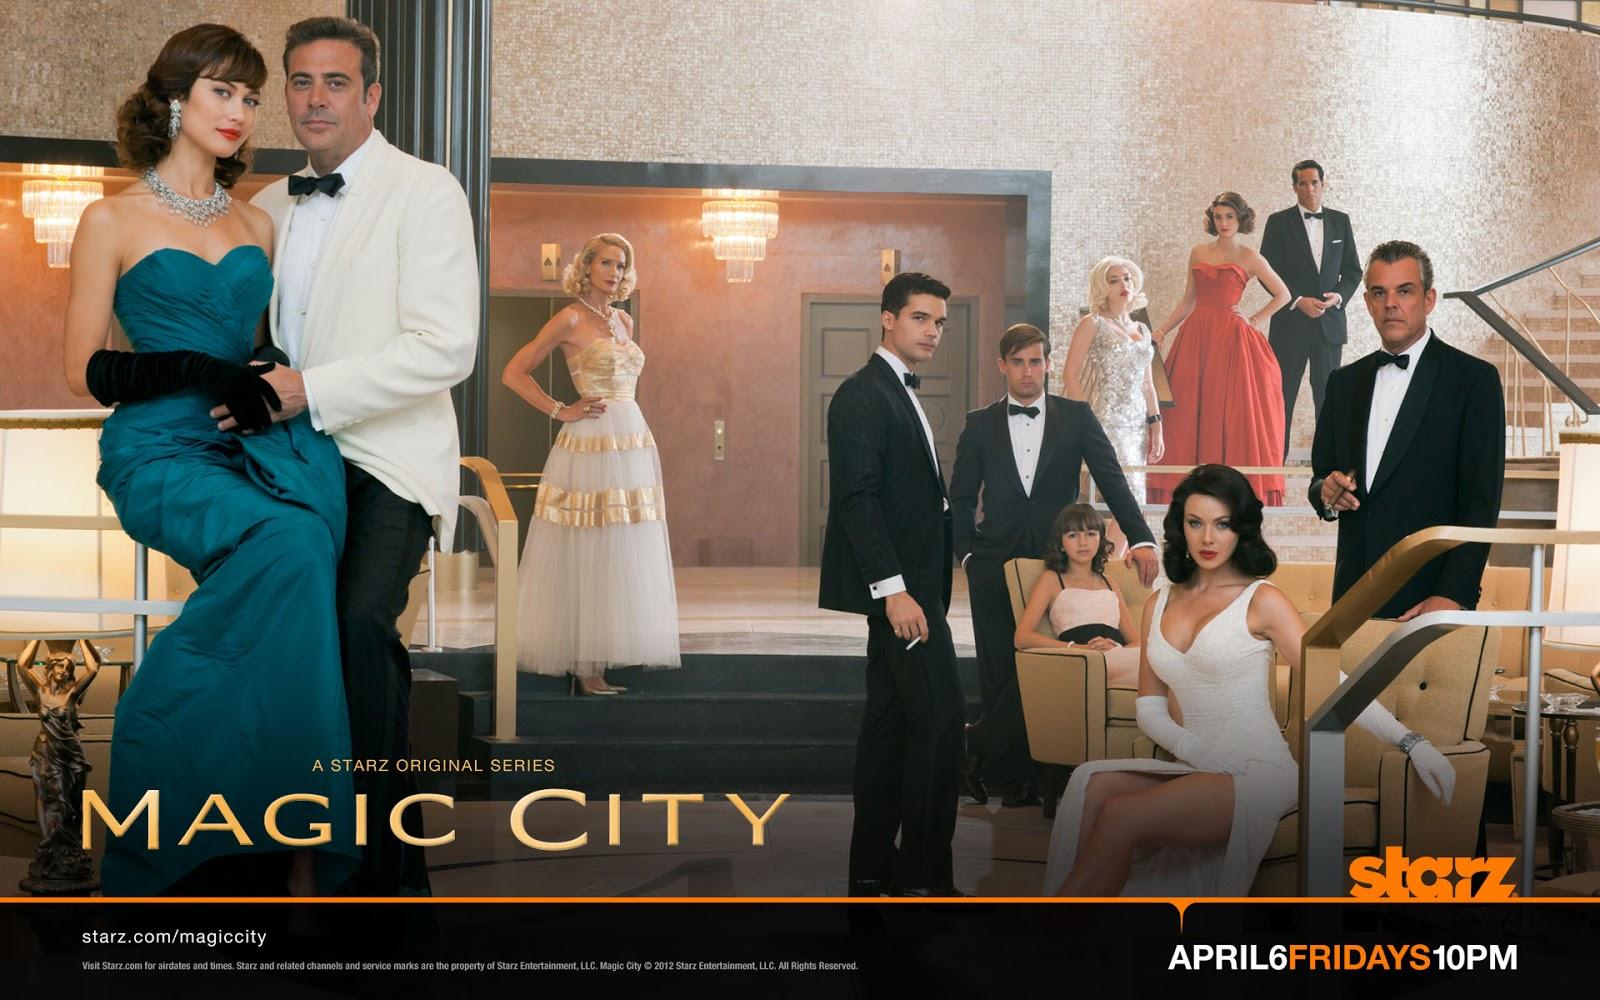 magic city starz - photo #1